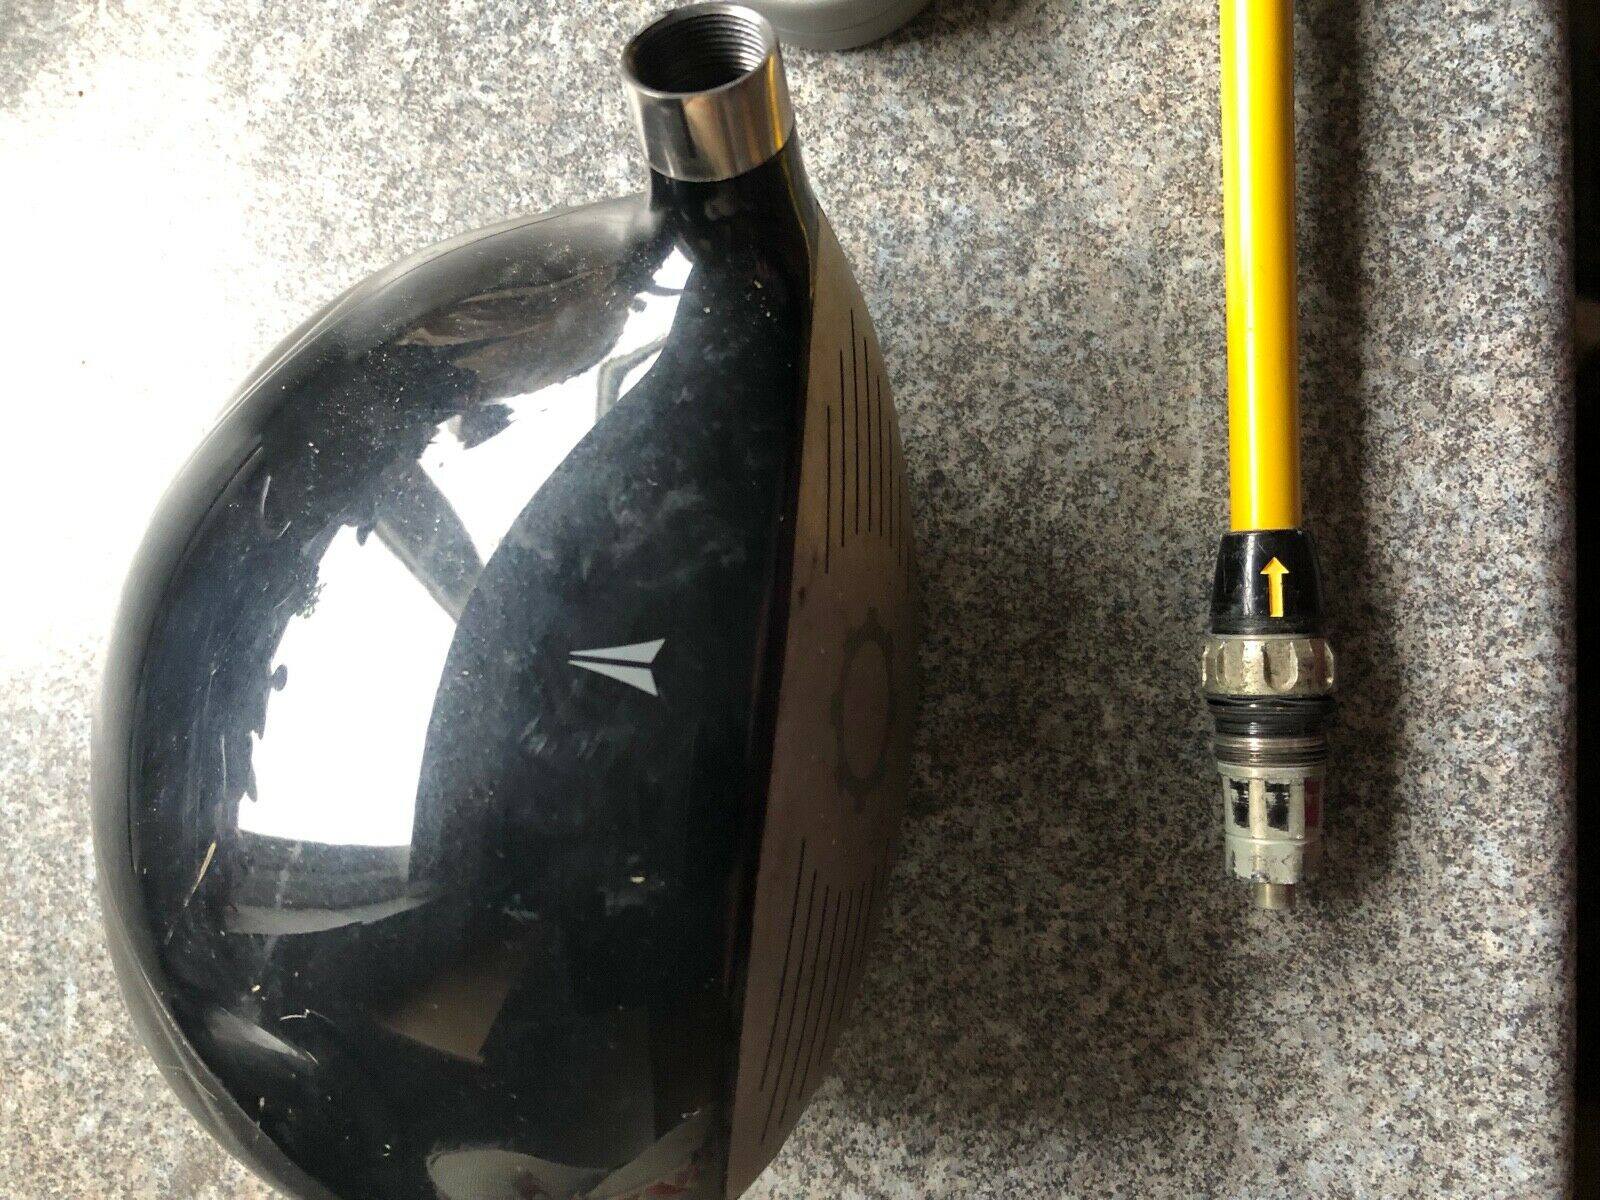 Nike Sq Dymo controlador STR8-FIT 9.5 grados projootipo Muy Raro